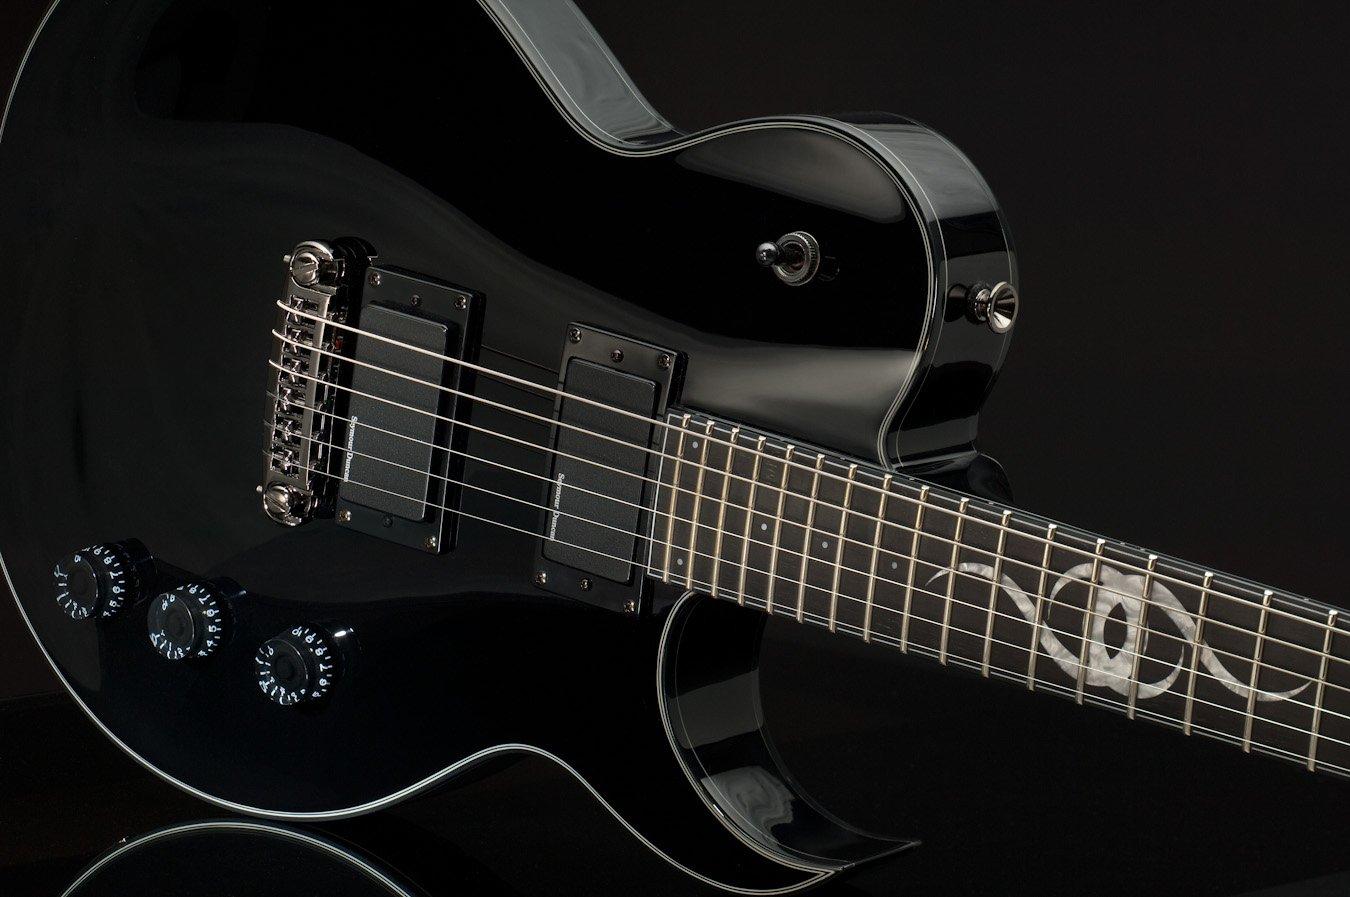 Ethan Hart Guitar EH-1 Black Single Cutaway with White Binding